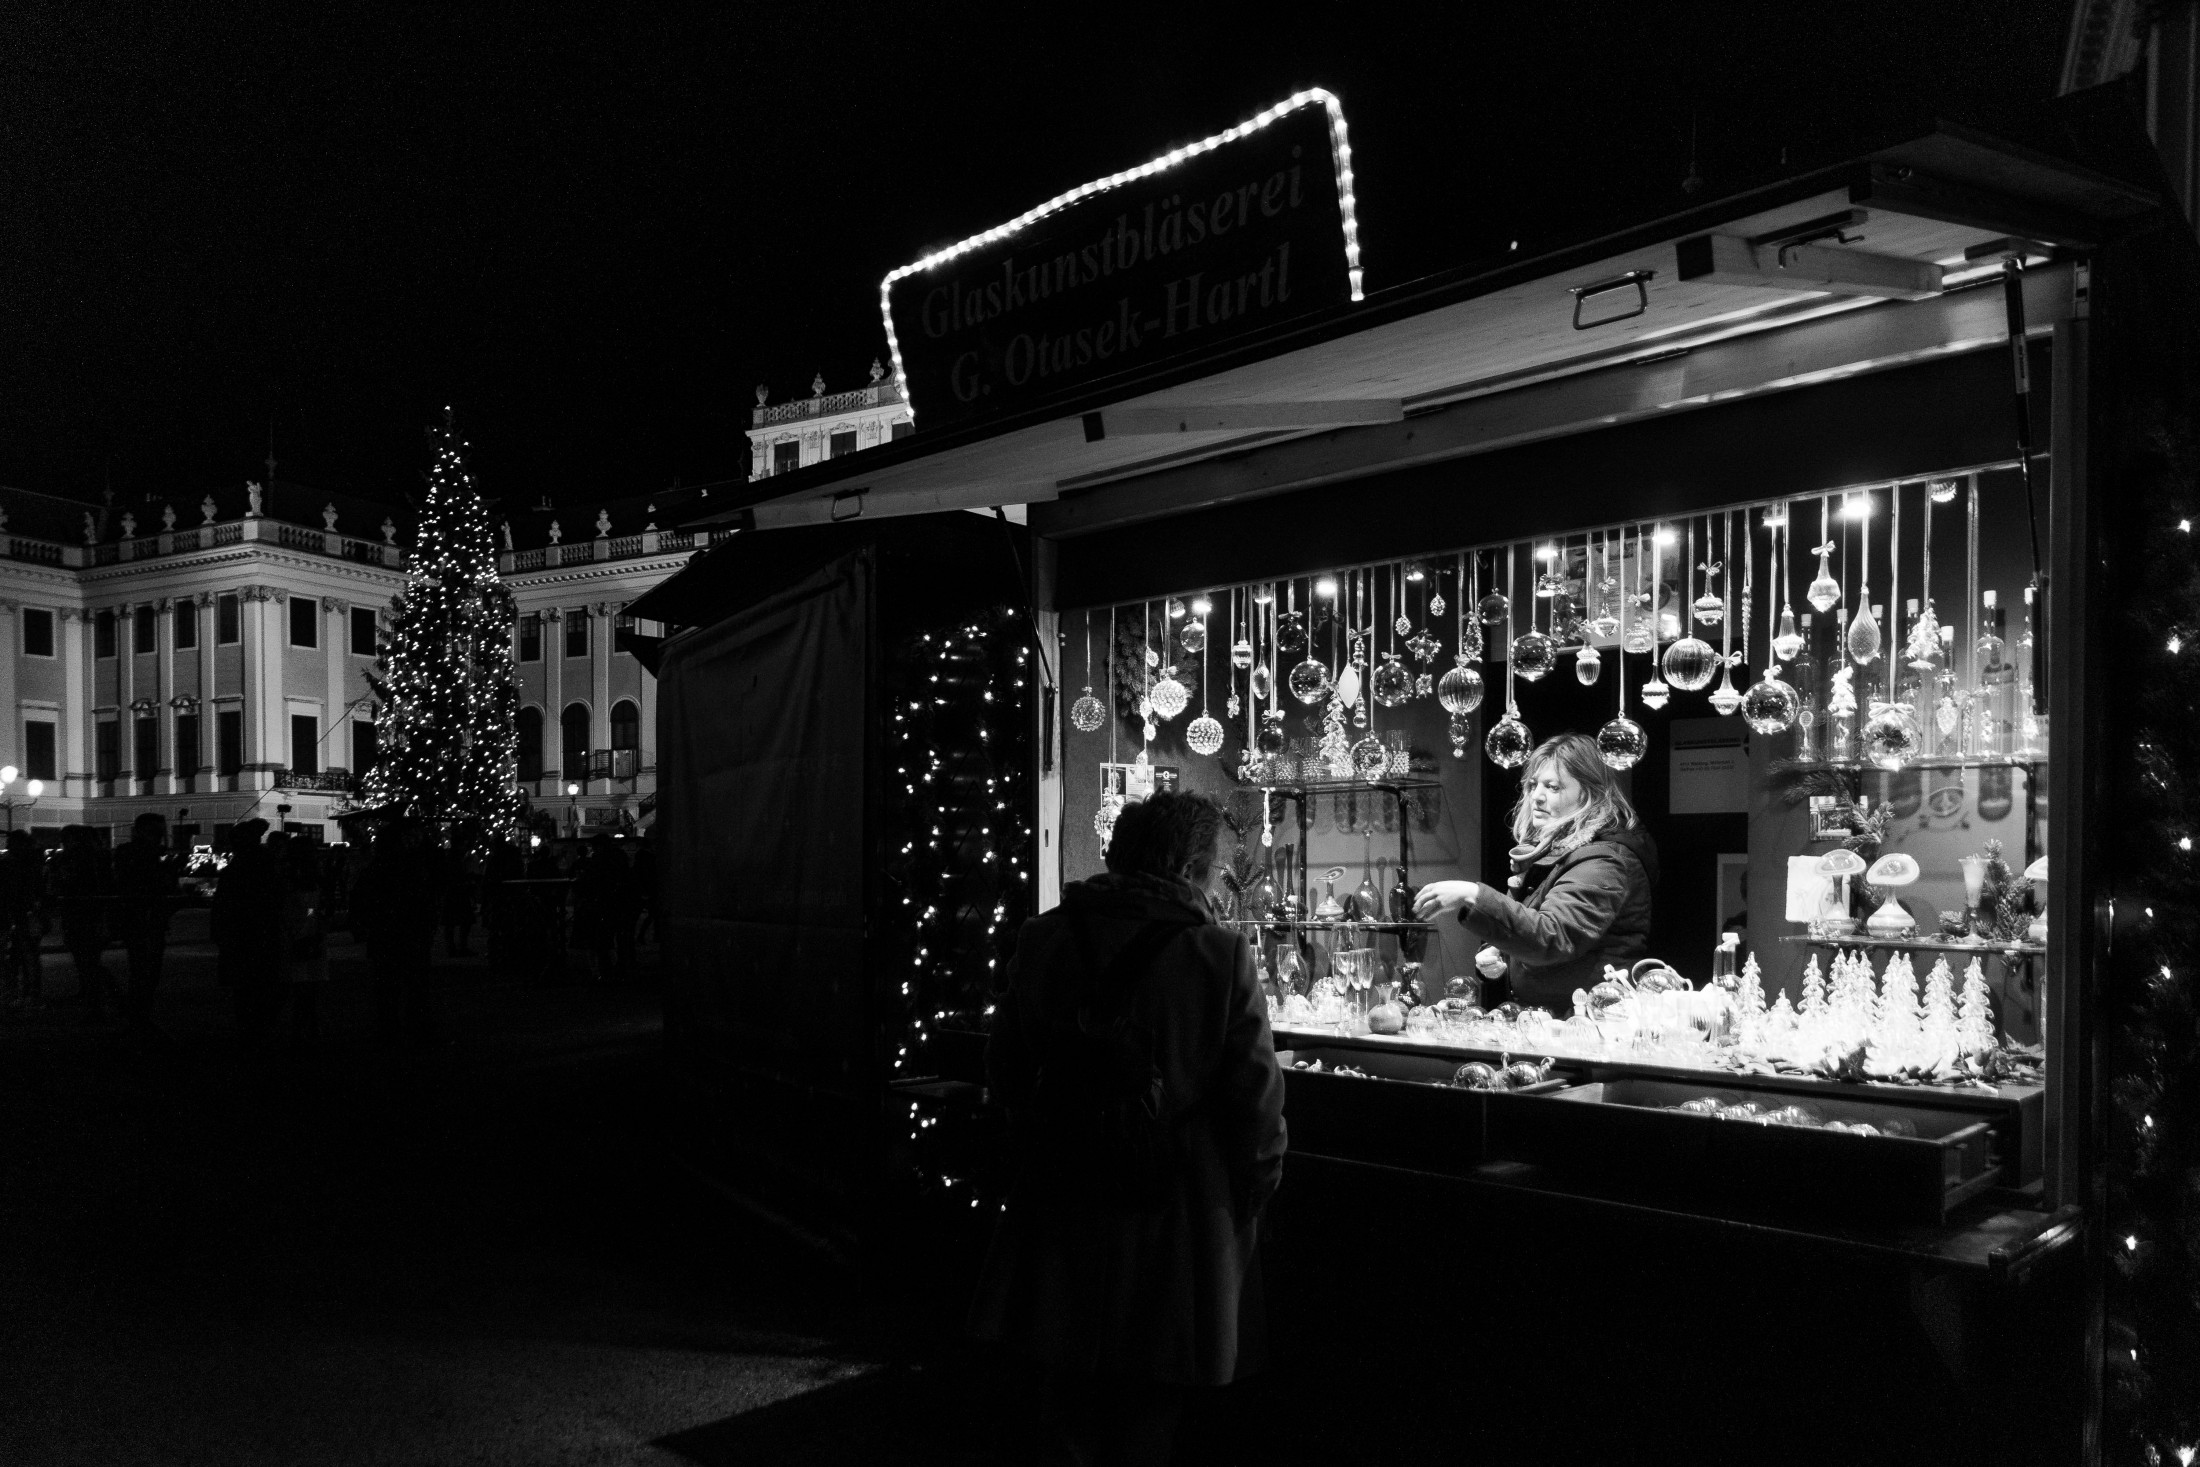 Schönbrunn Christmas market booth